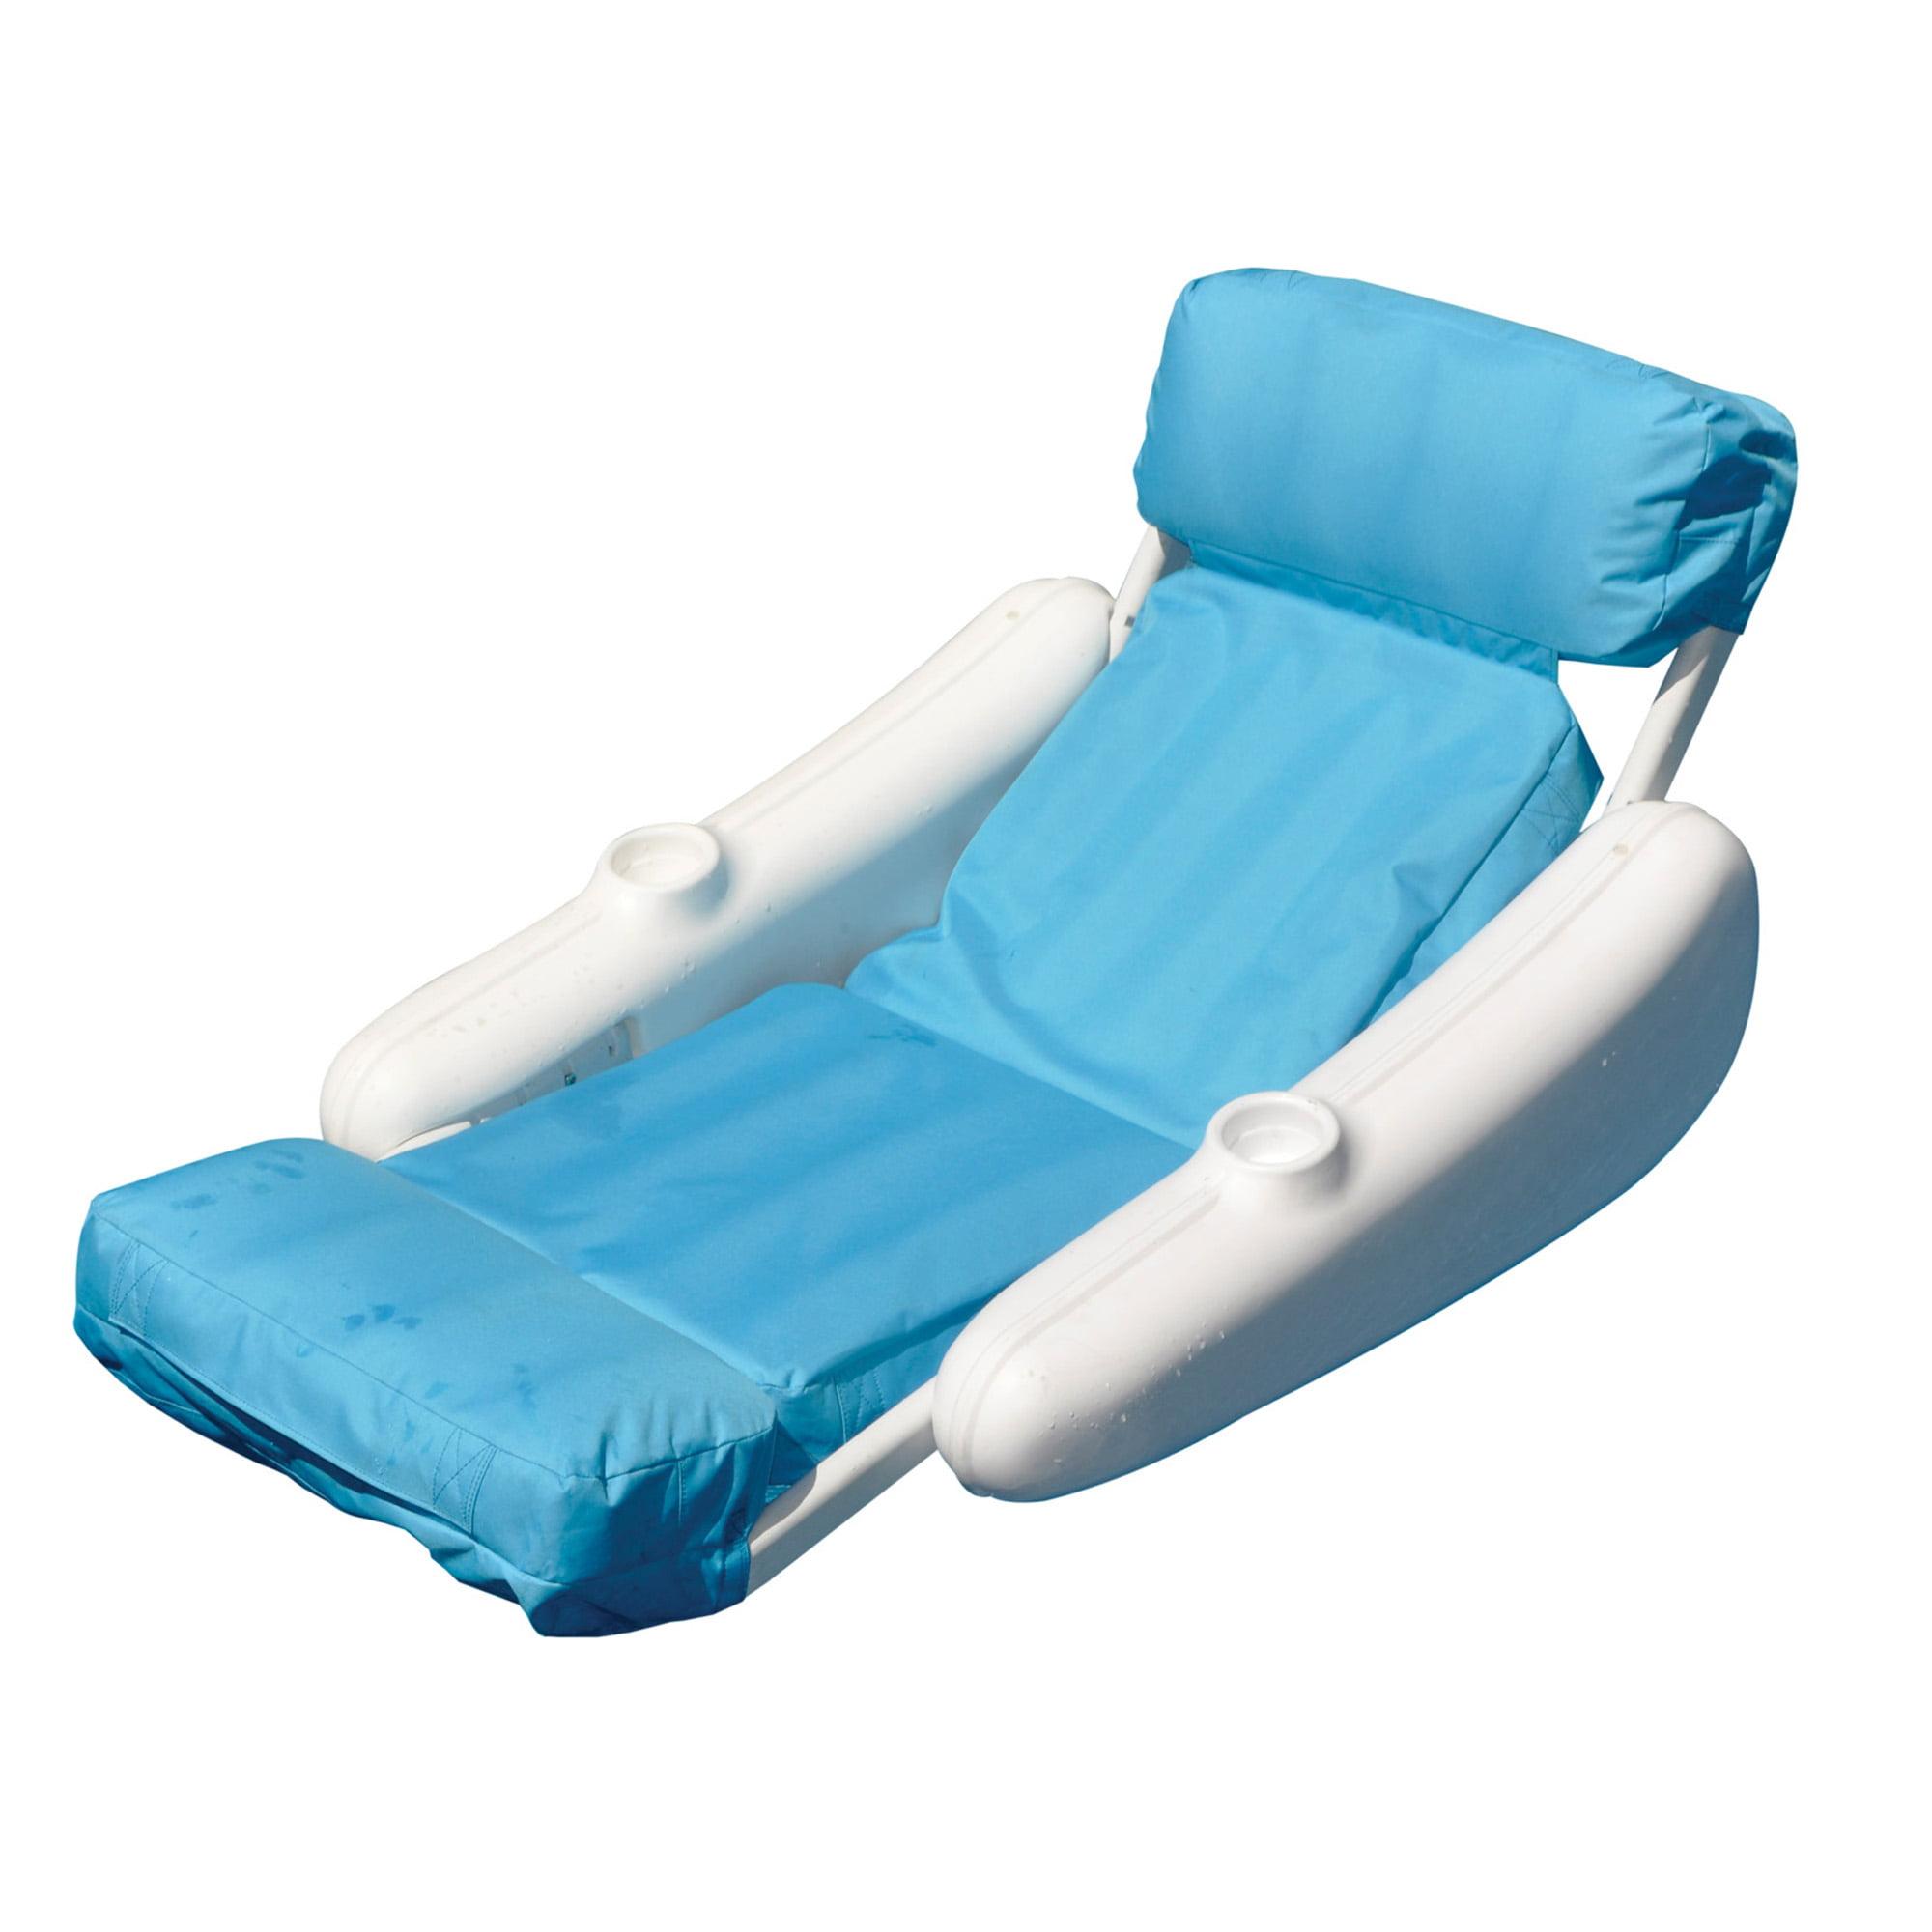 Swimline SunChaser Luxury Floating Pool Lounger Walmart